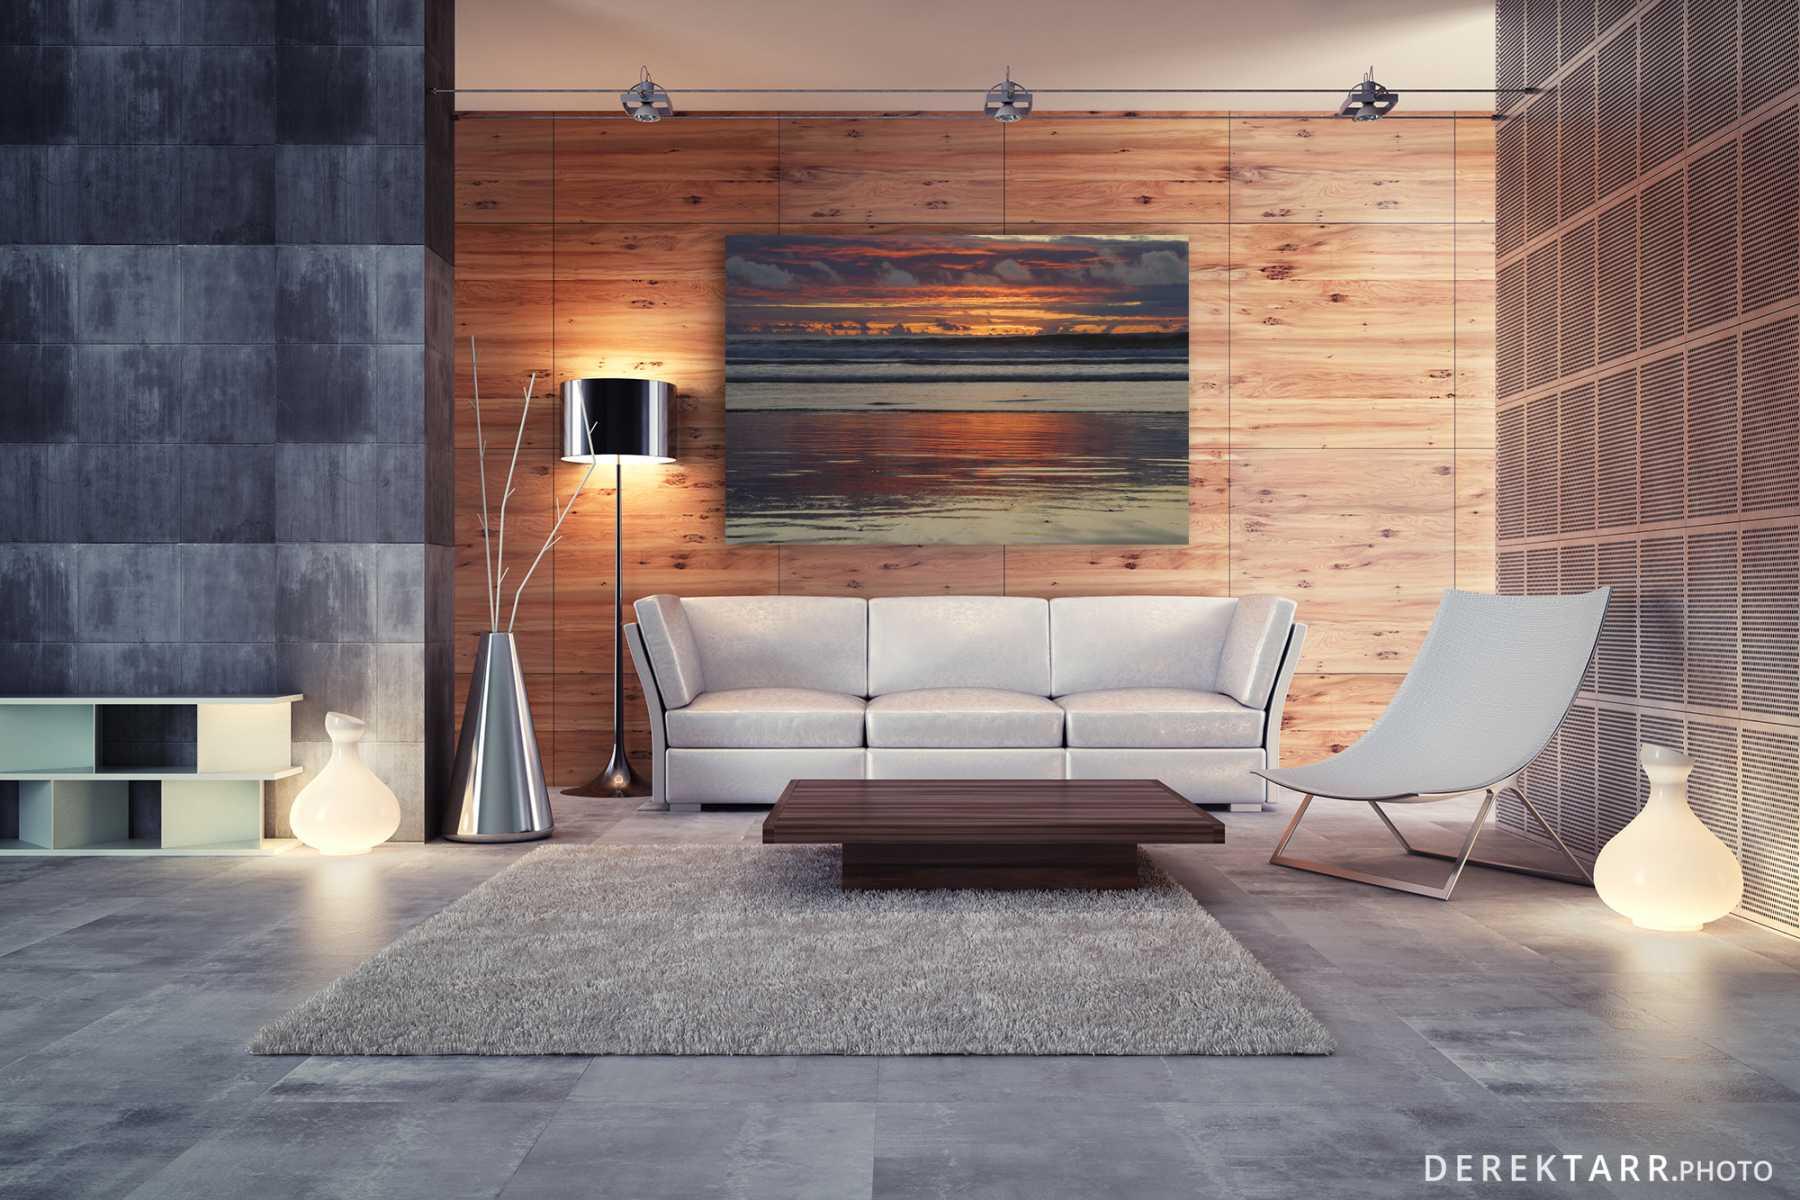 Modern minimalist living room with Beach Sunset photo on wall